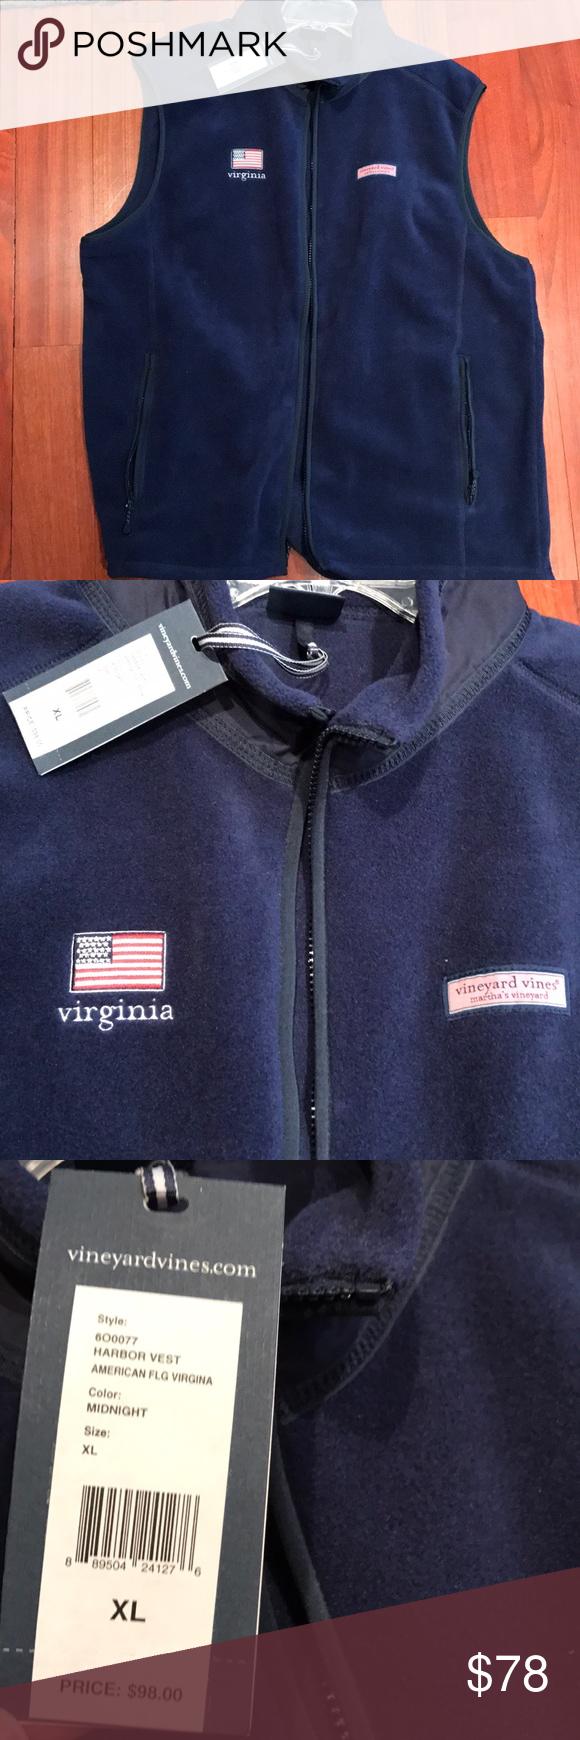 Menus vineyard vines xl harbor vest brand new american flag